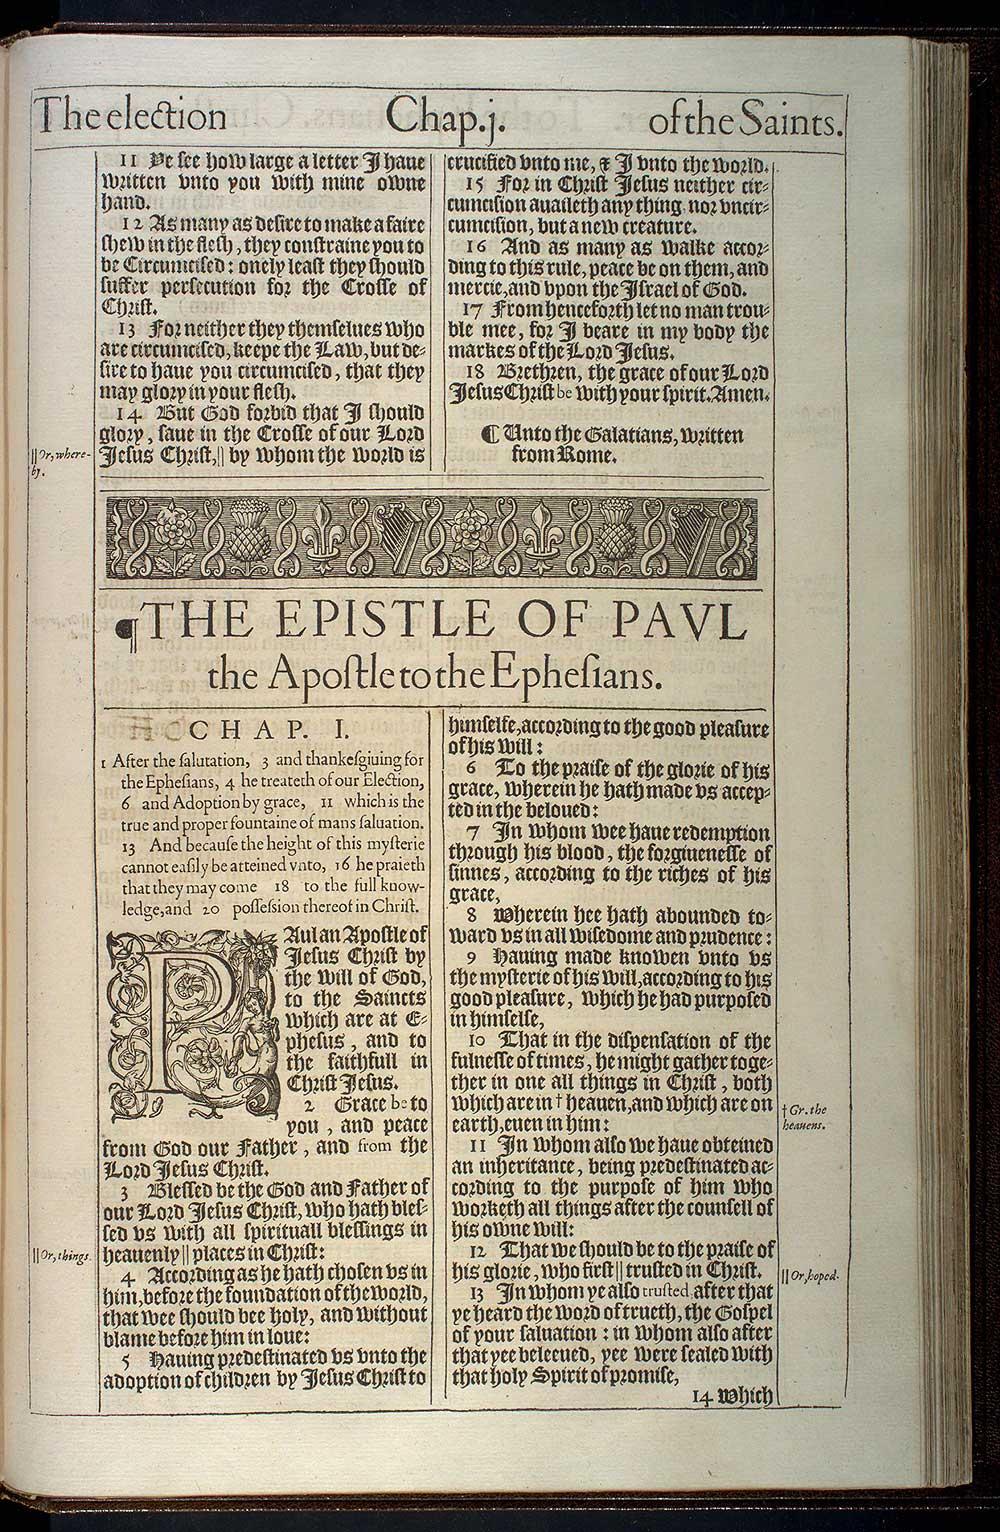 Ephesians Chapter 1 Original 1611 Bible Scan